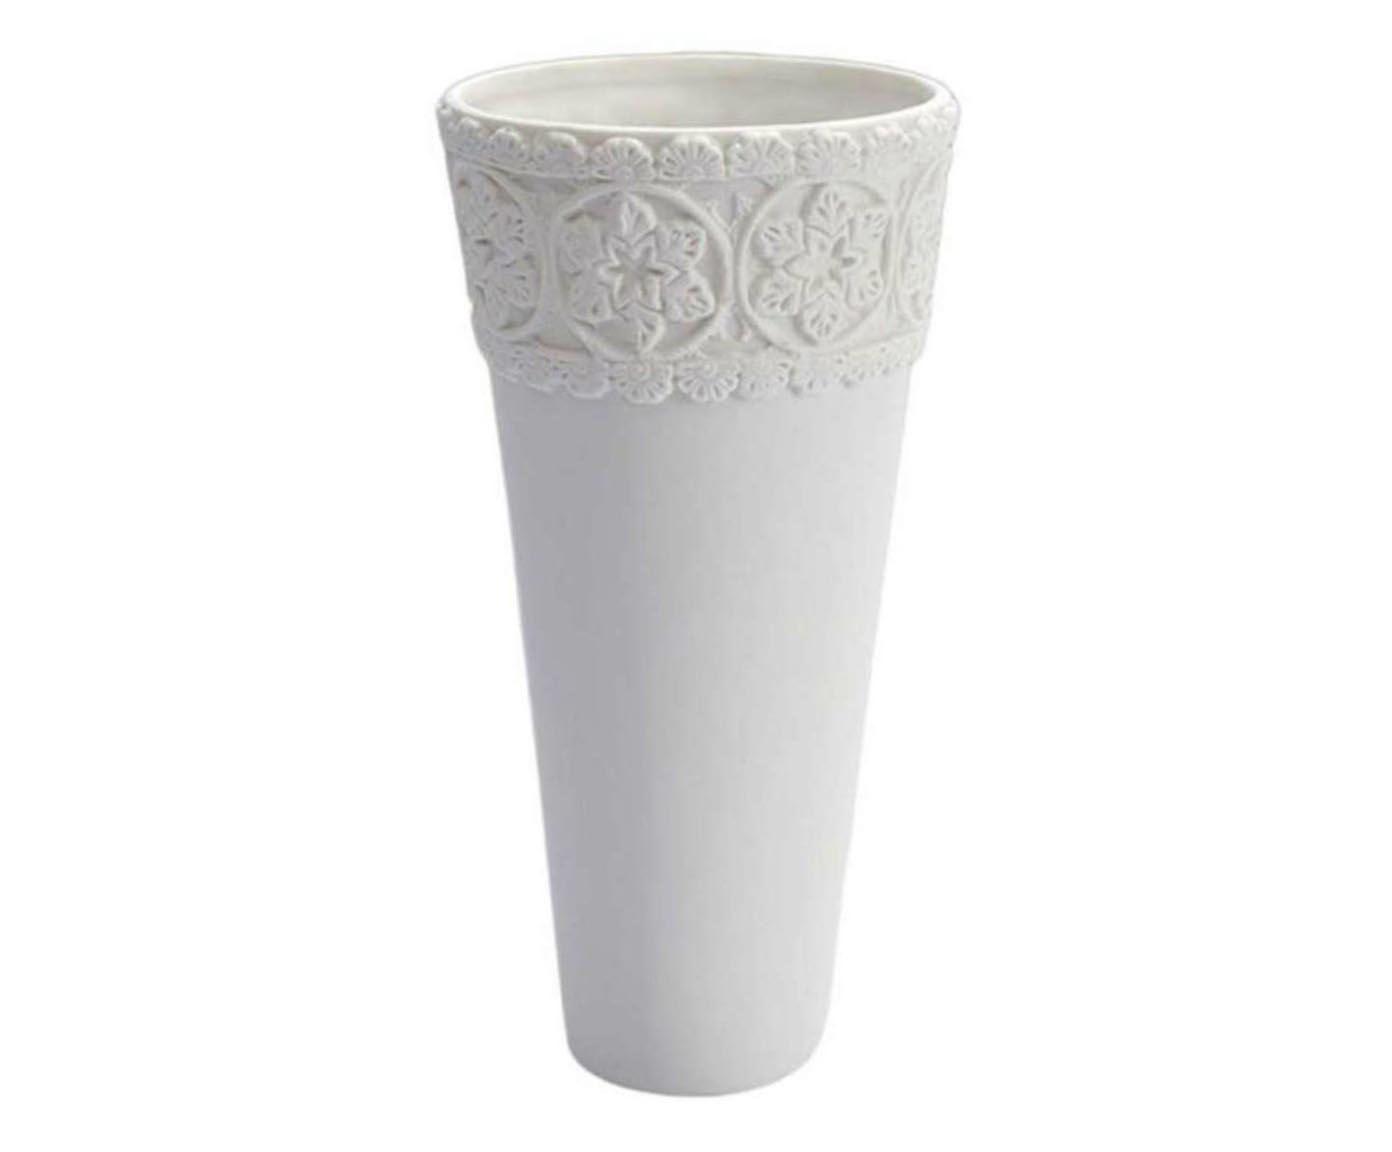 Vaso petrier - 29 x 14 cm   Westwing.com.br